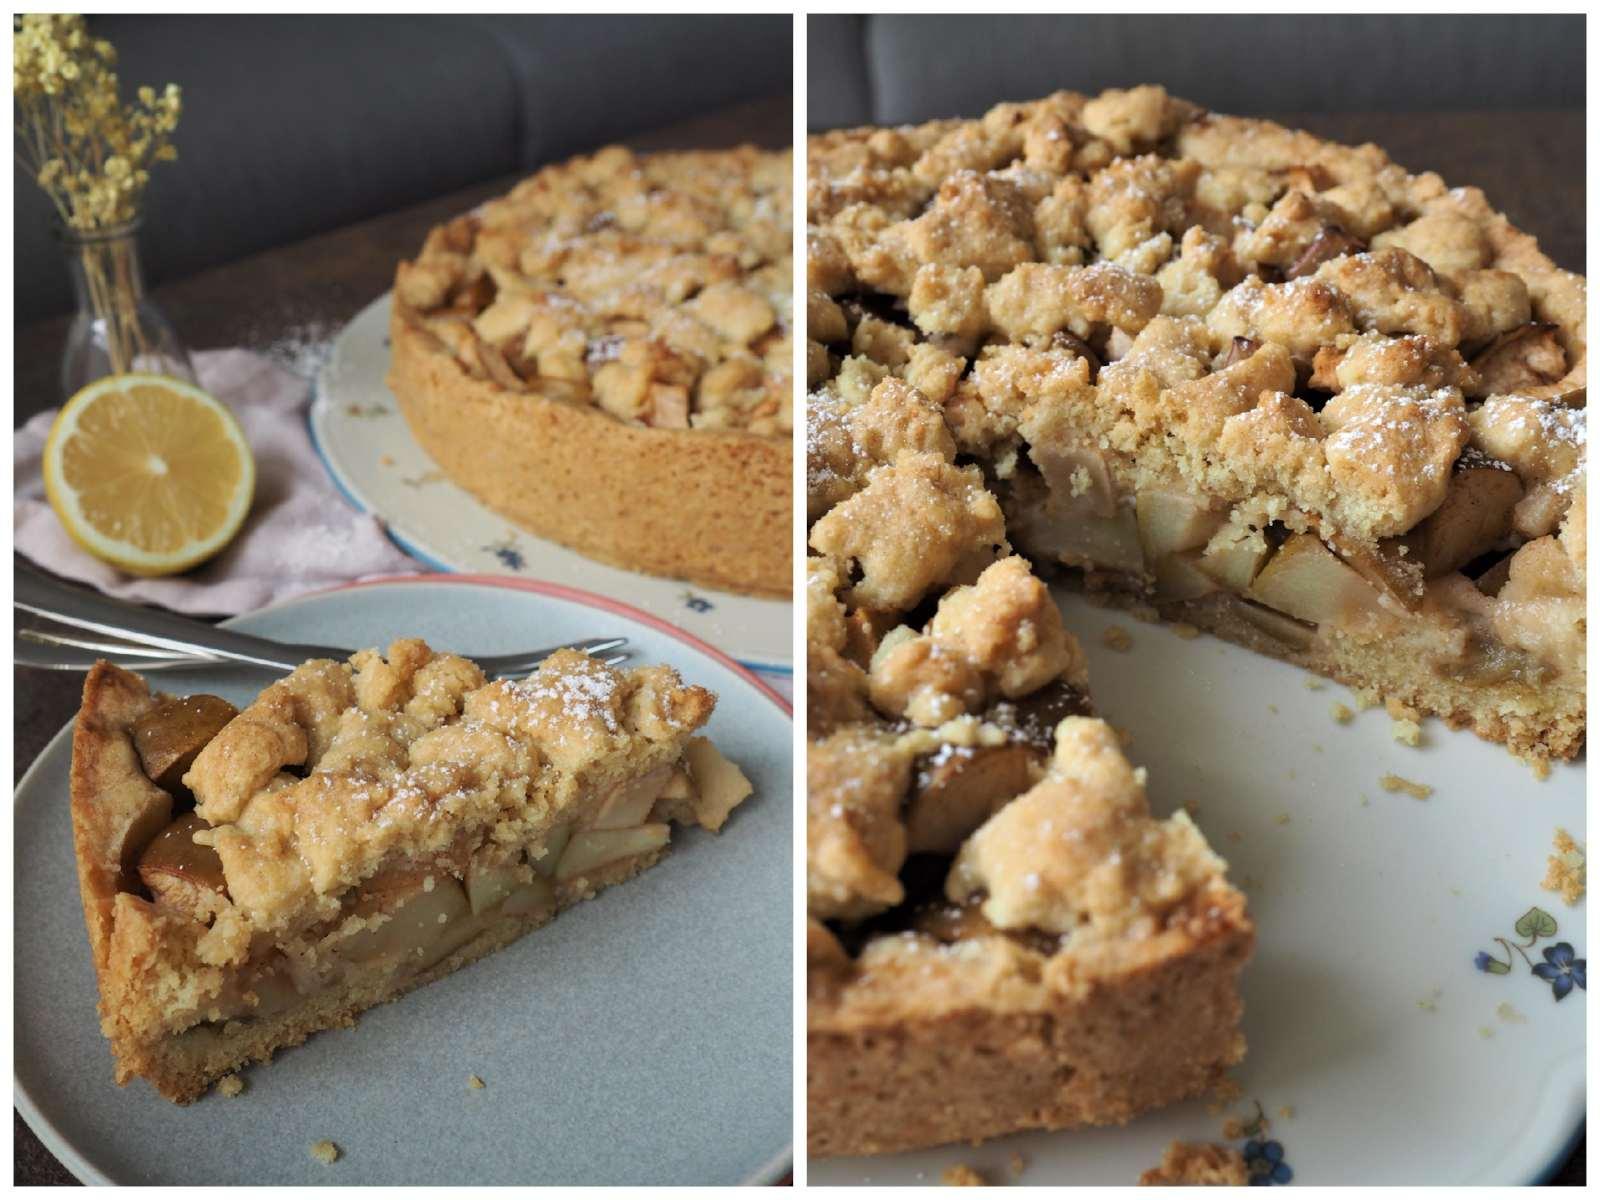 Veganer Apfel-Streusel-Kuchen im Detail